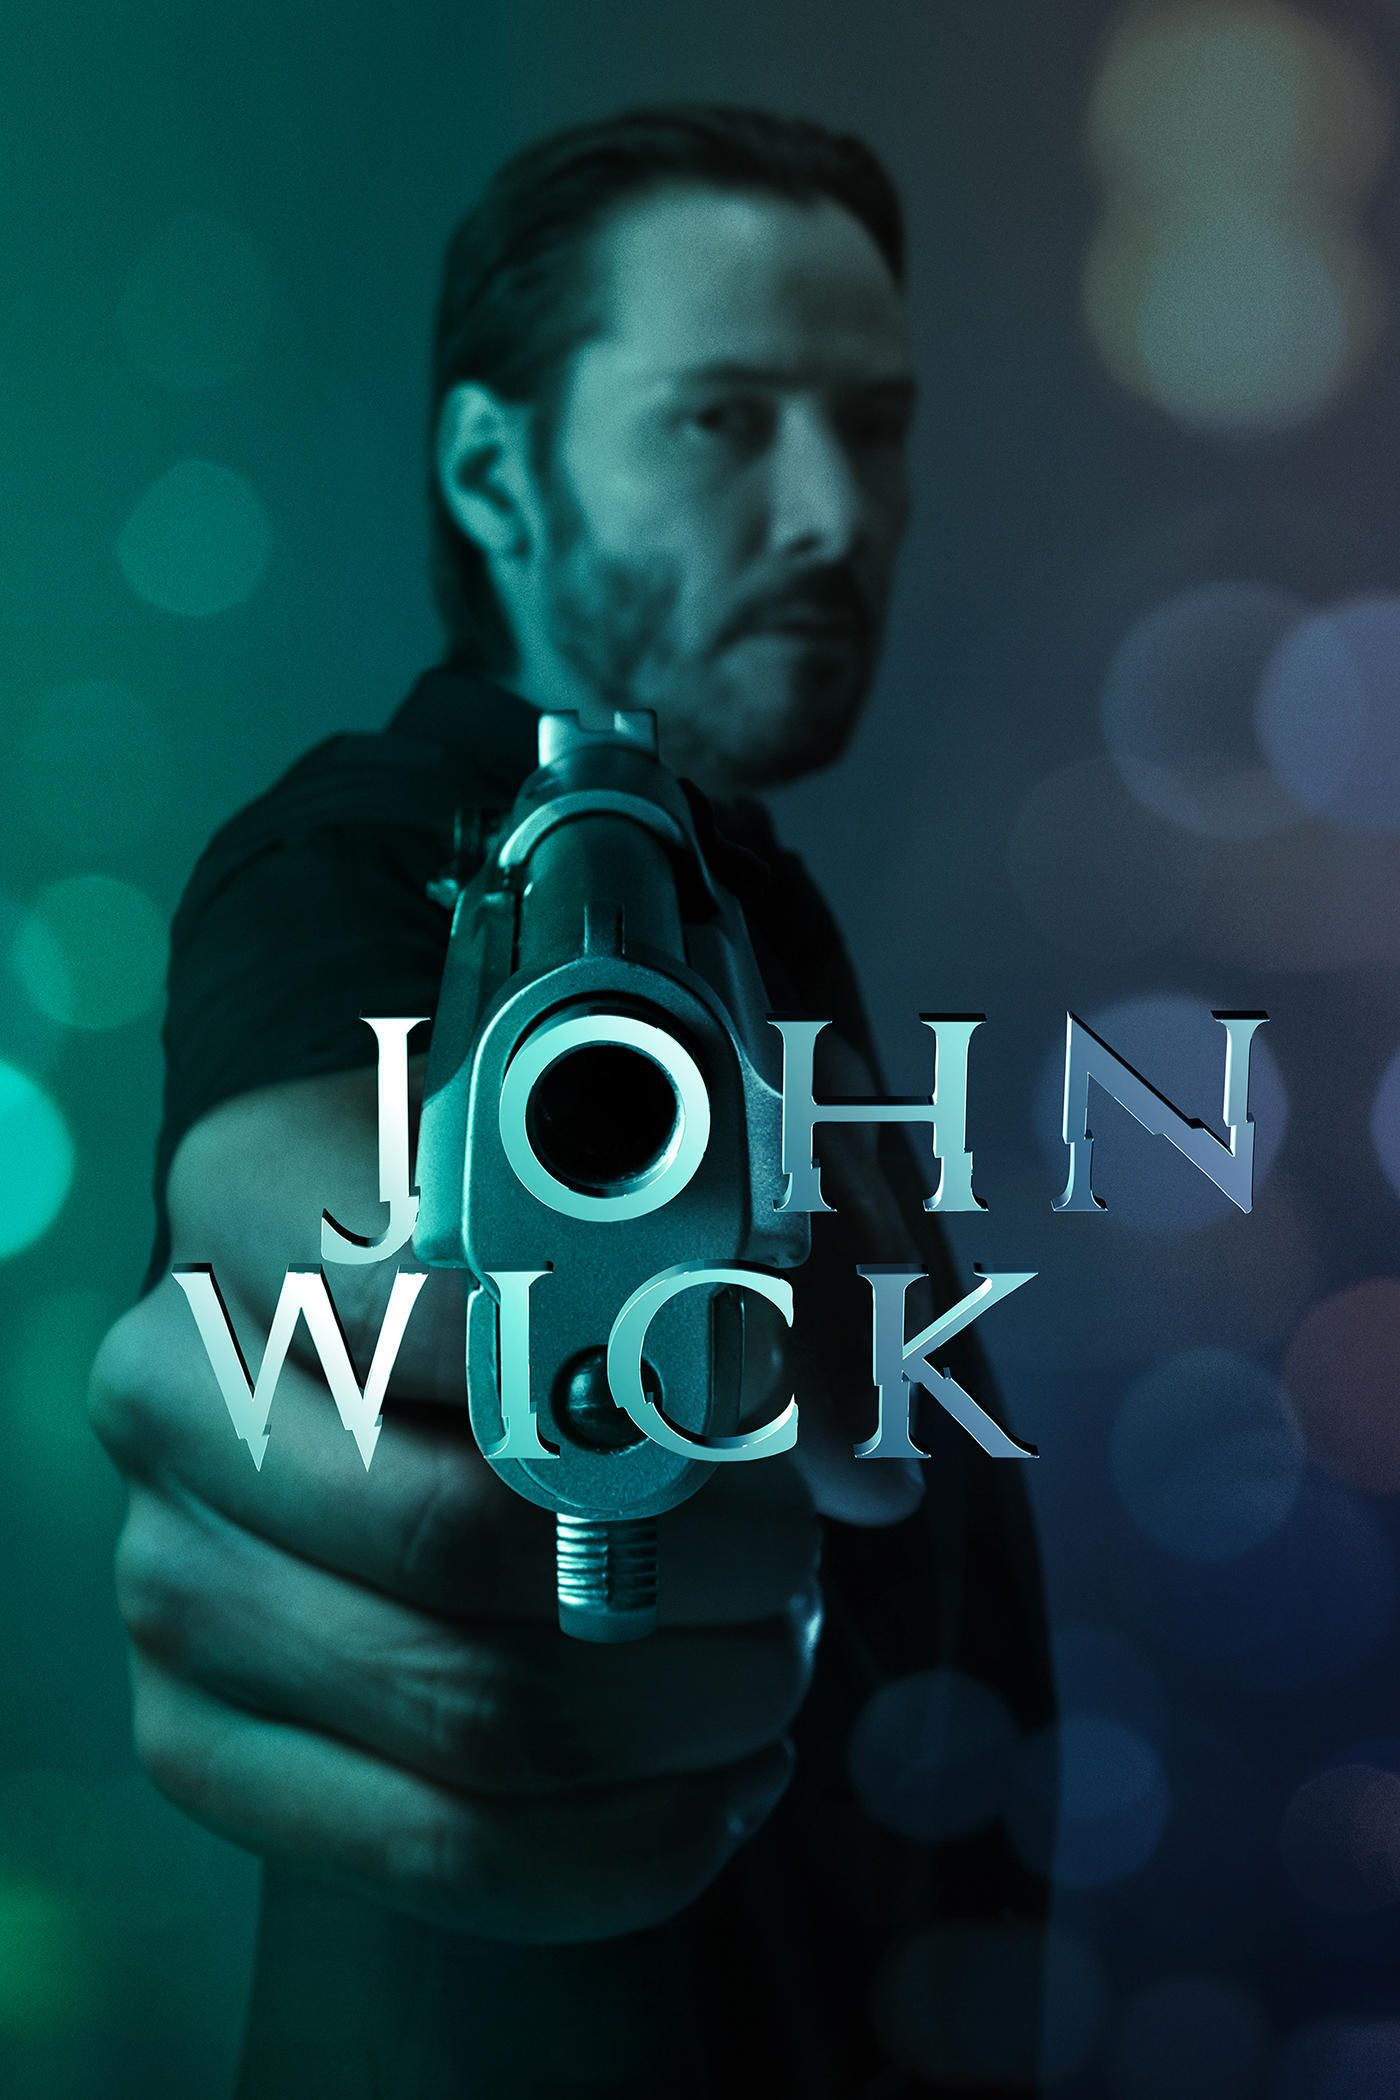 john wick 2 hdrip subtitles